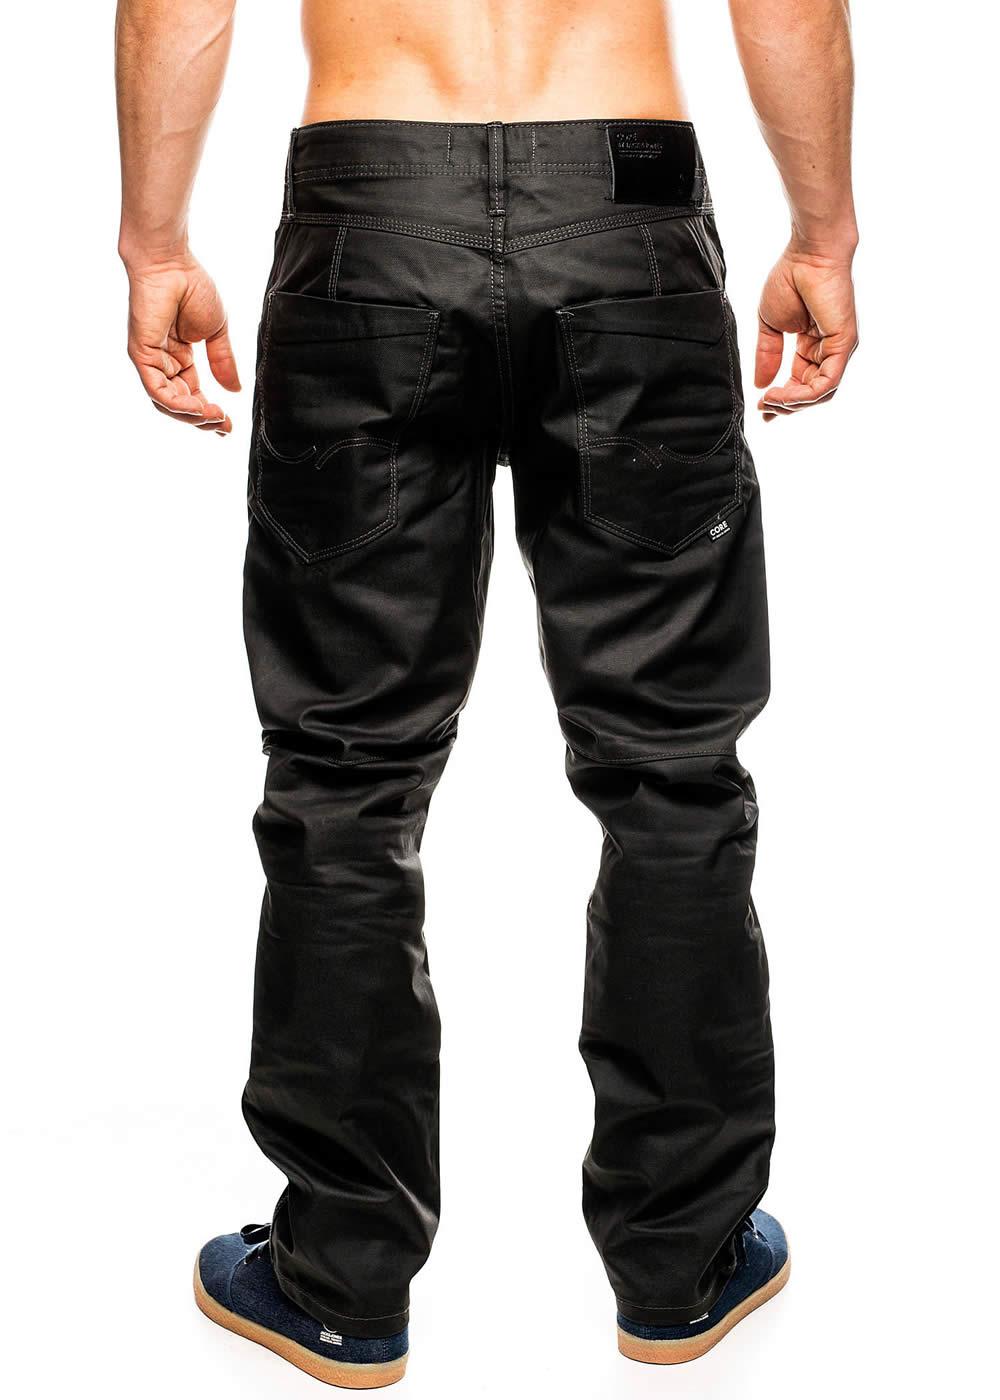 jack and jones jeans stan adam 12080454 at 864 noos. Black Bedroom Furniture Sets. Home Design Ideas